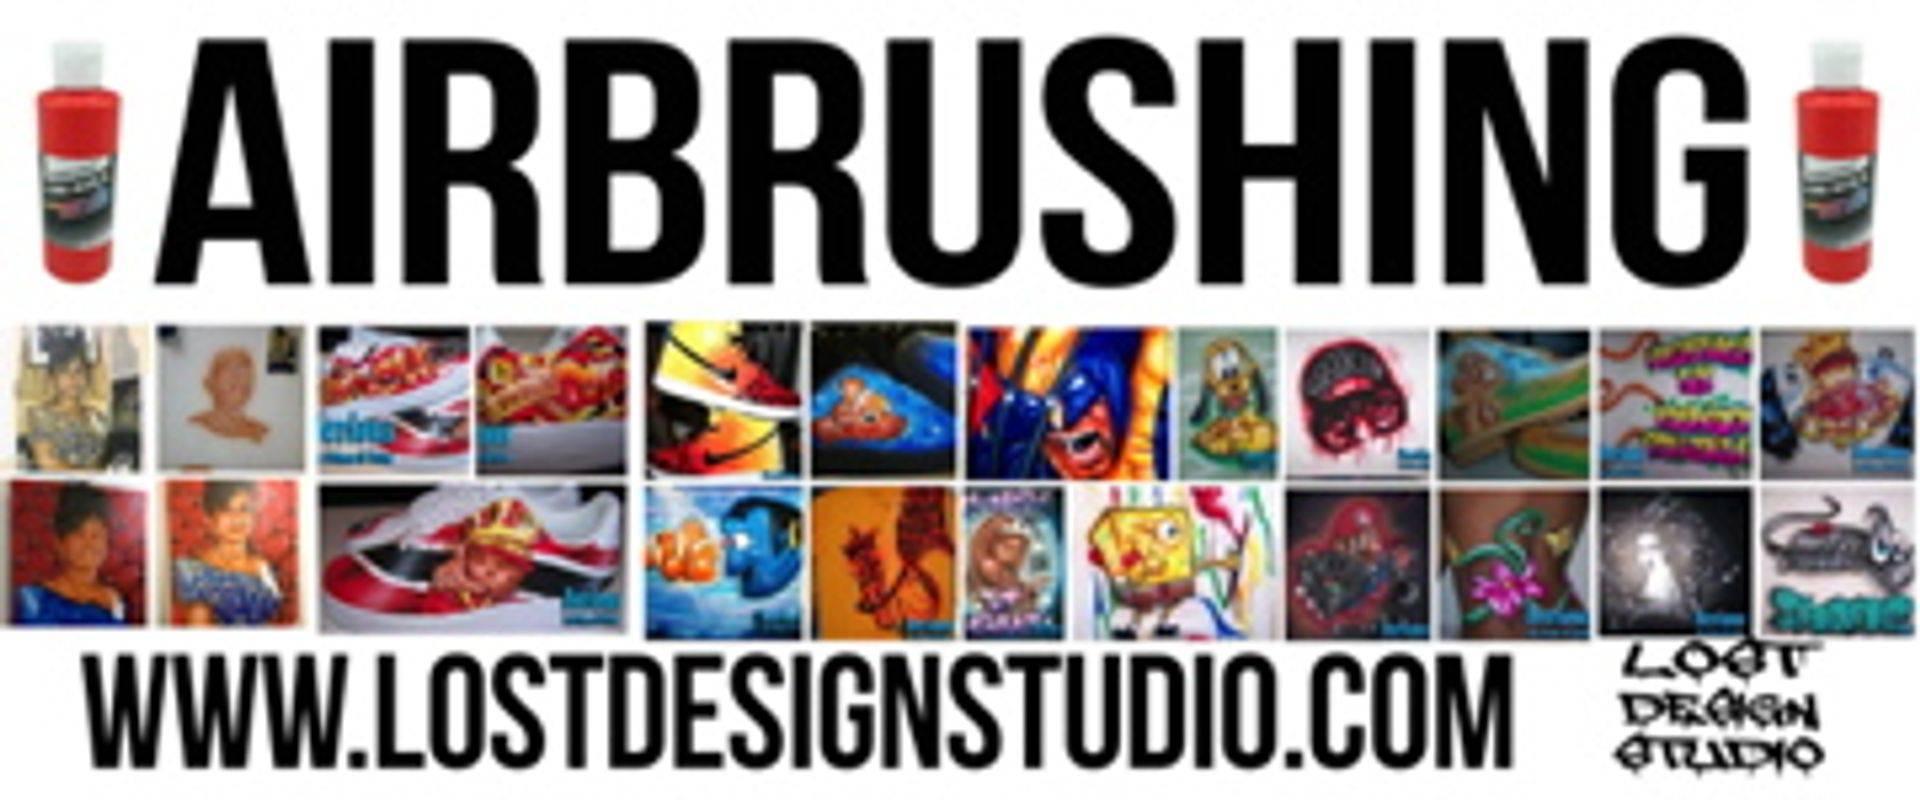 Lost Design Studio Printed T-shirts Flyer